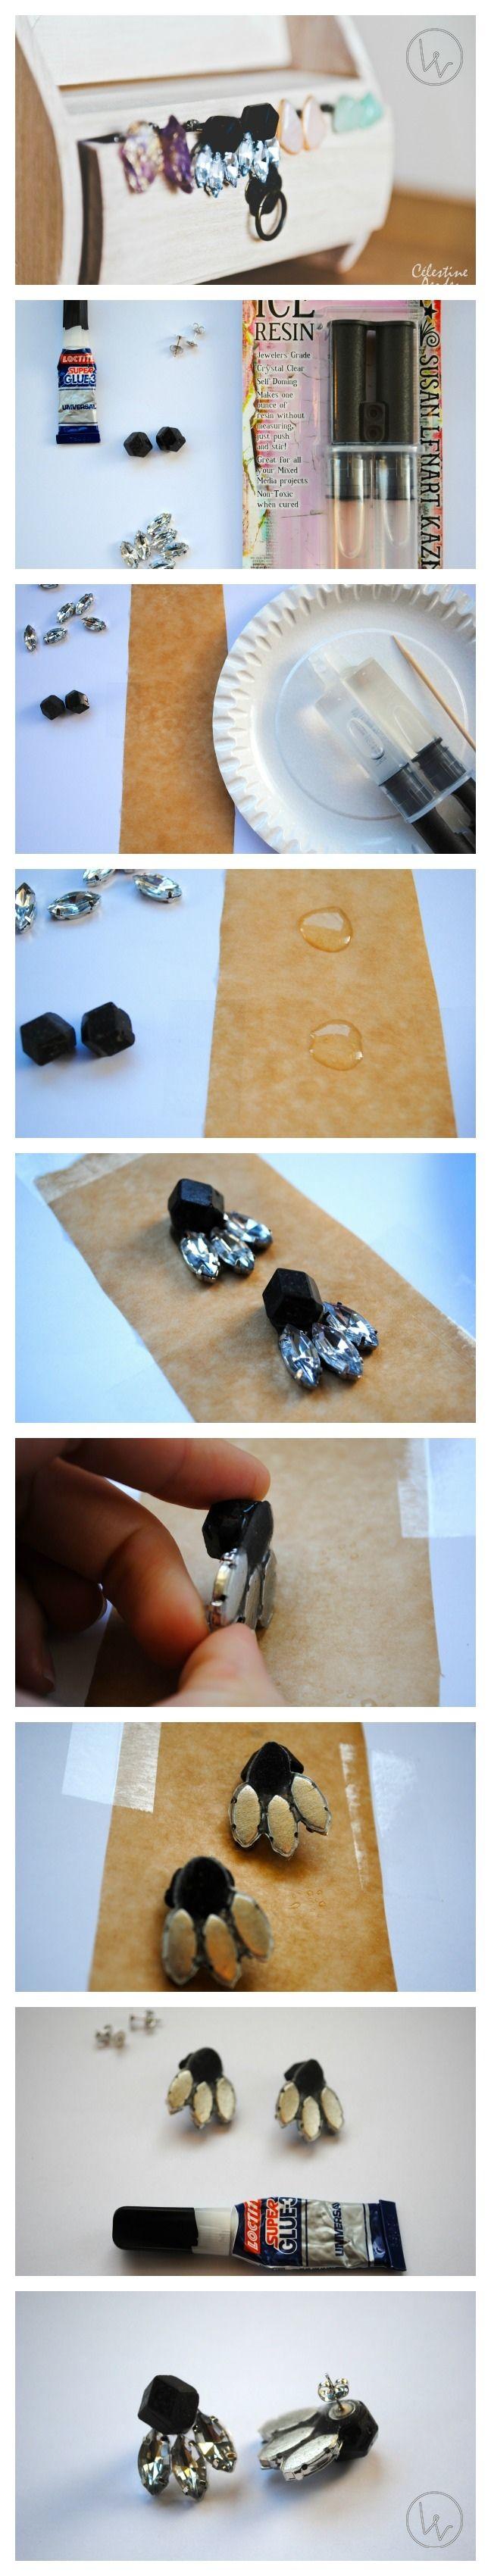 DIY Gemstone Earrings - Louvintage - more: http://louvintage.weebly.com/4/post/2014/02/diy-gemstone-earrings-part-ii.html